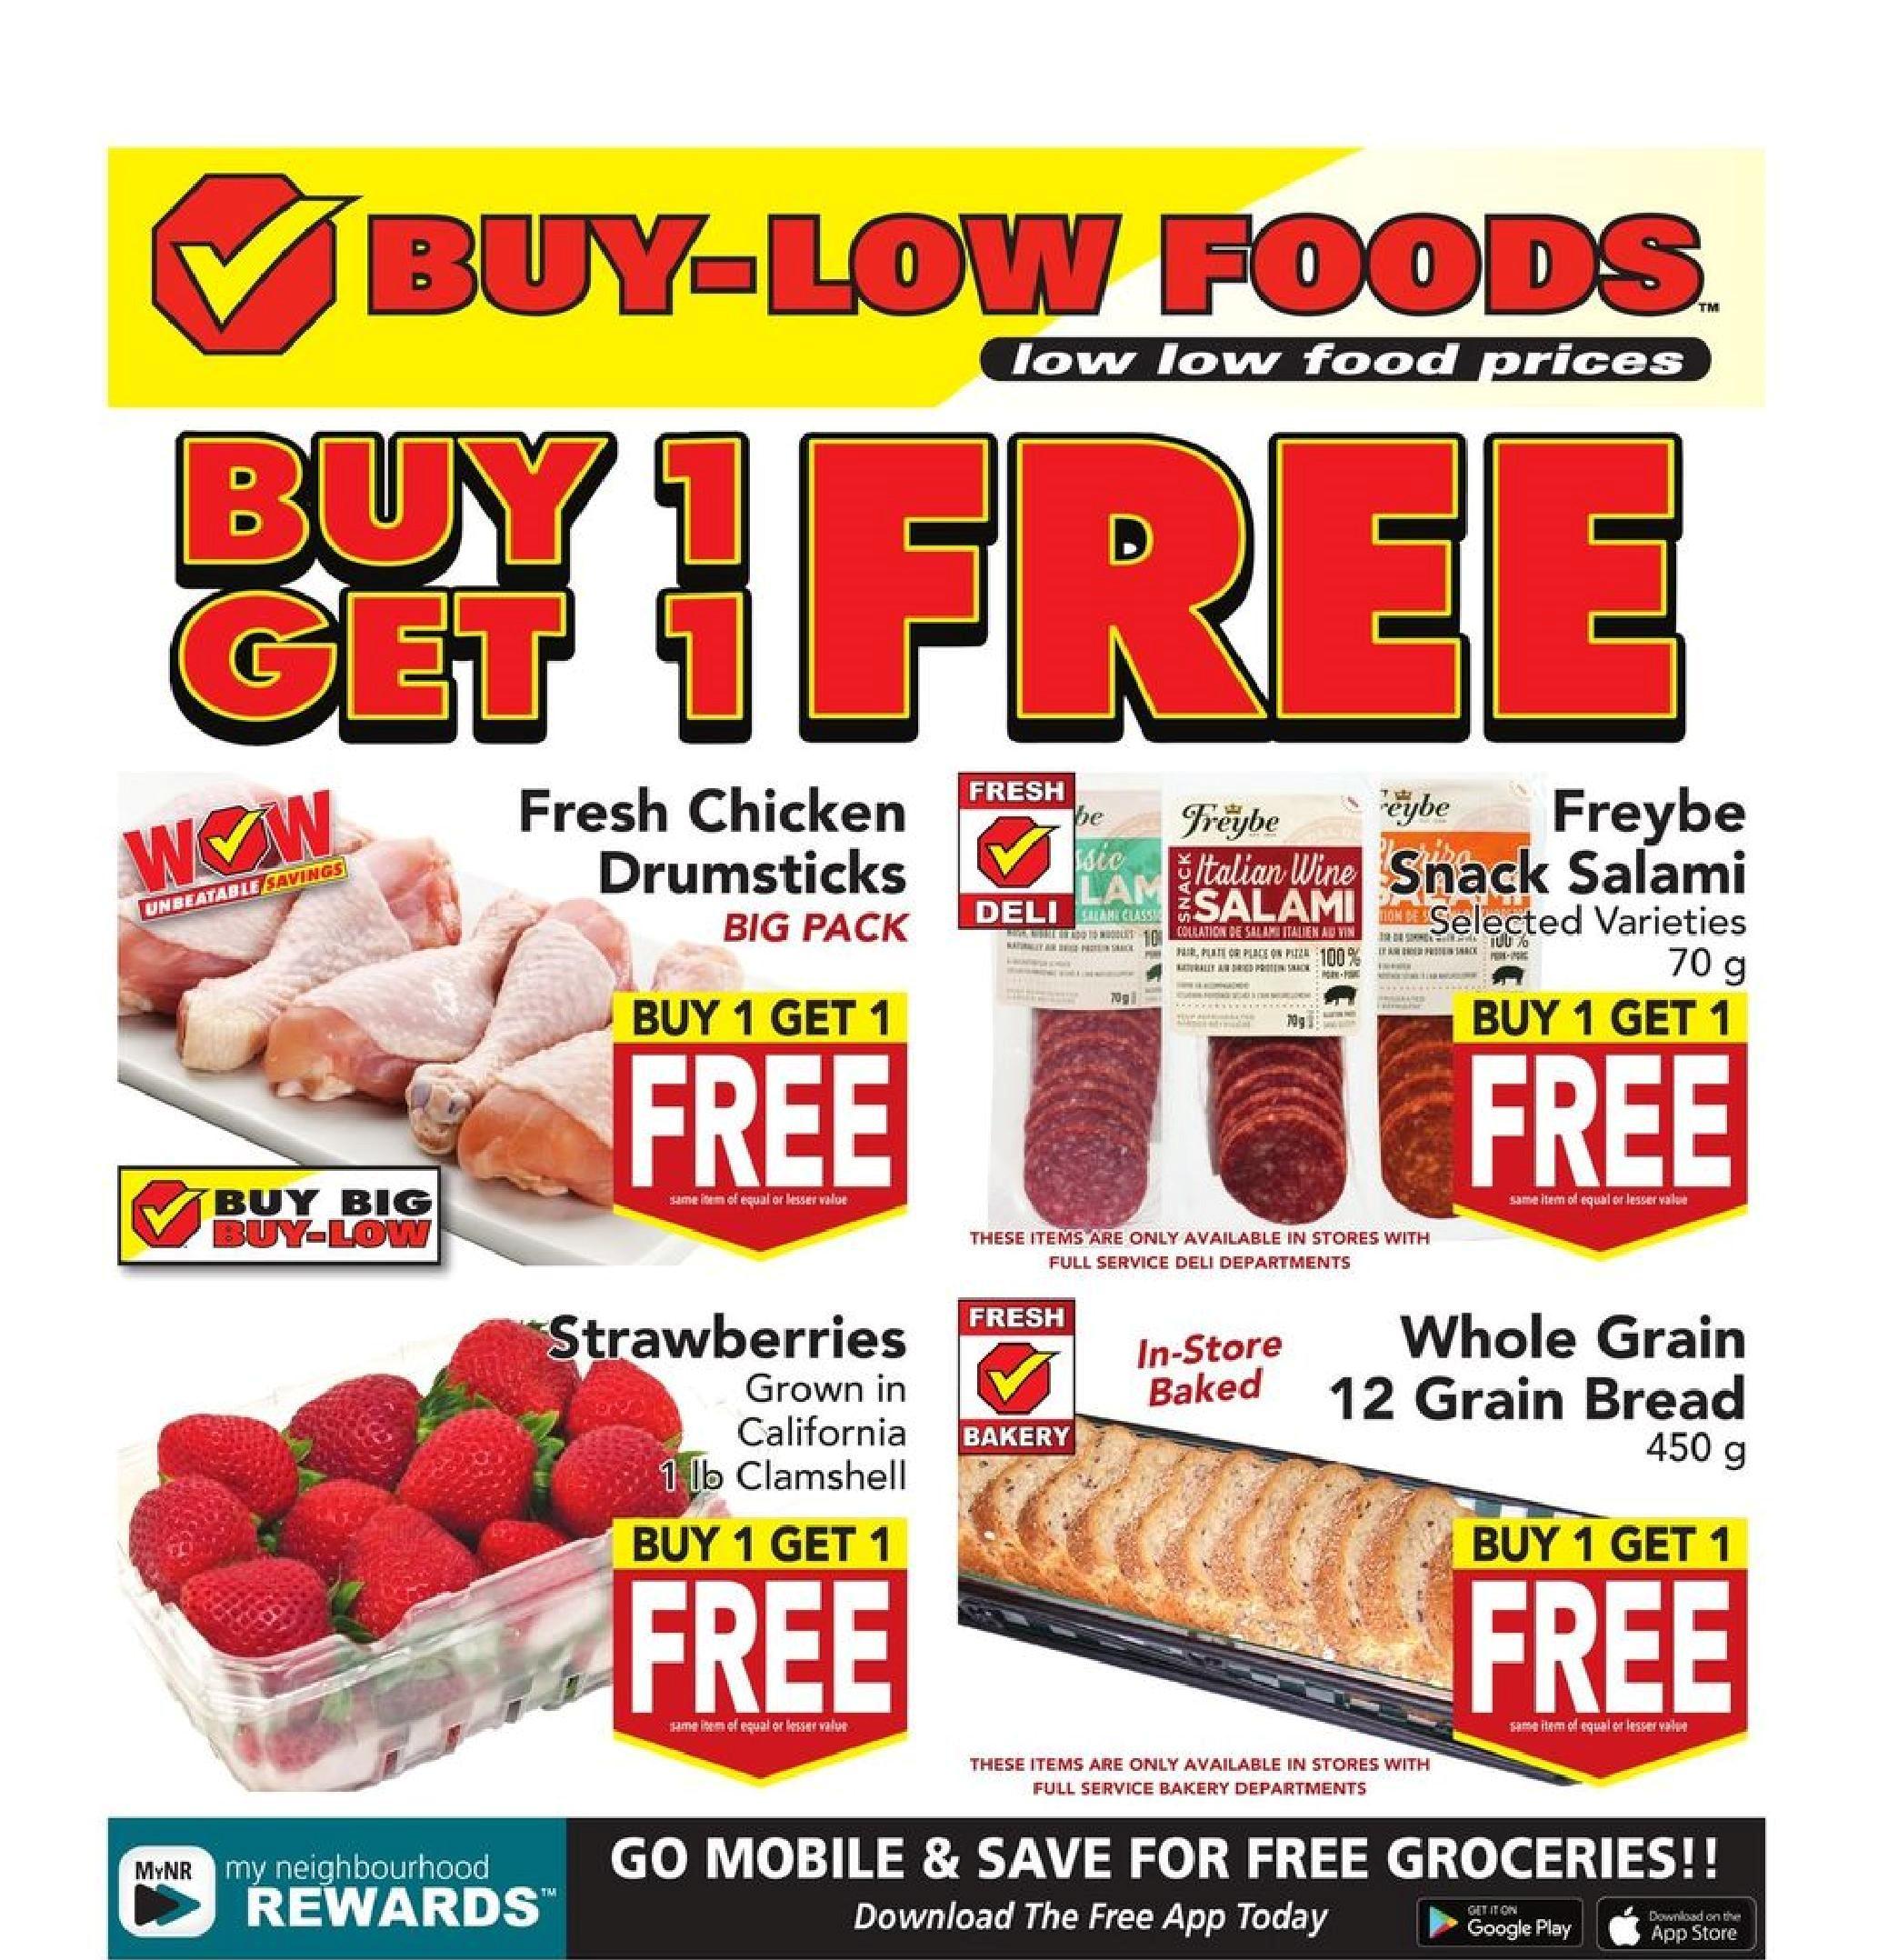 Buy-Low Foods Flyer May 9